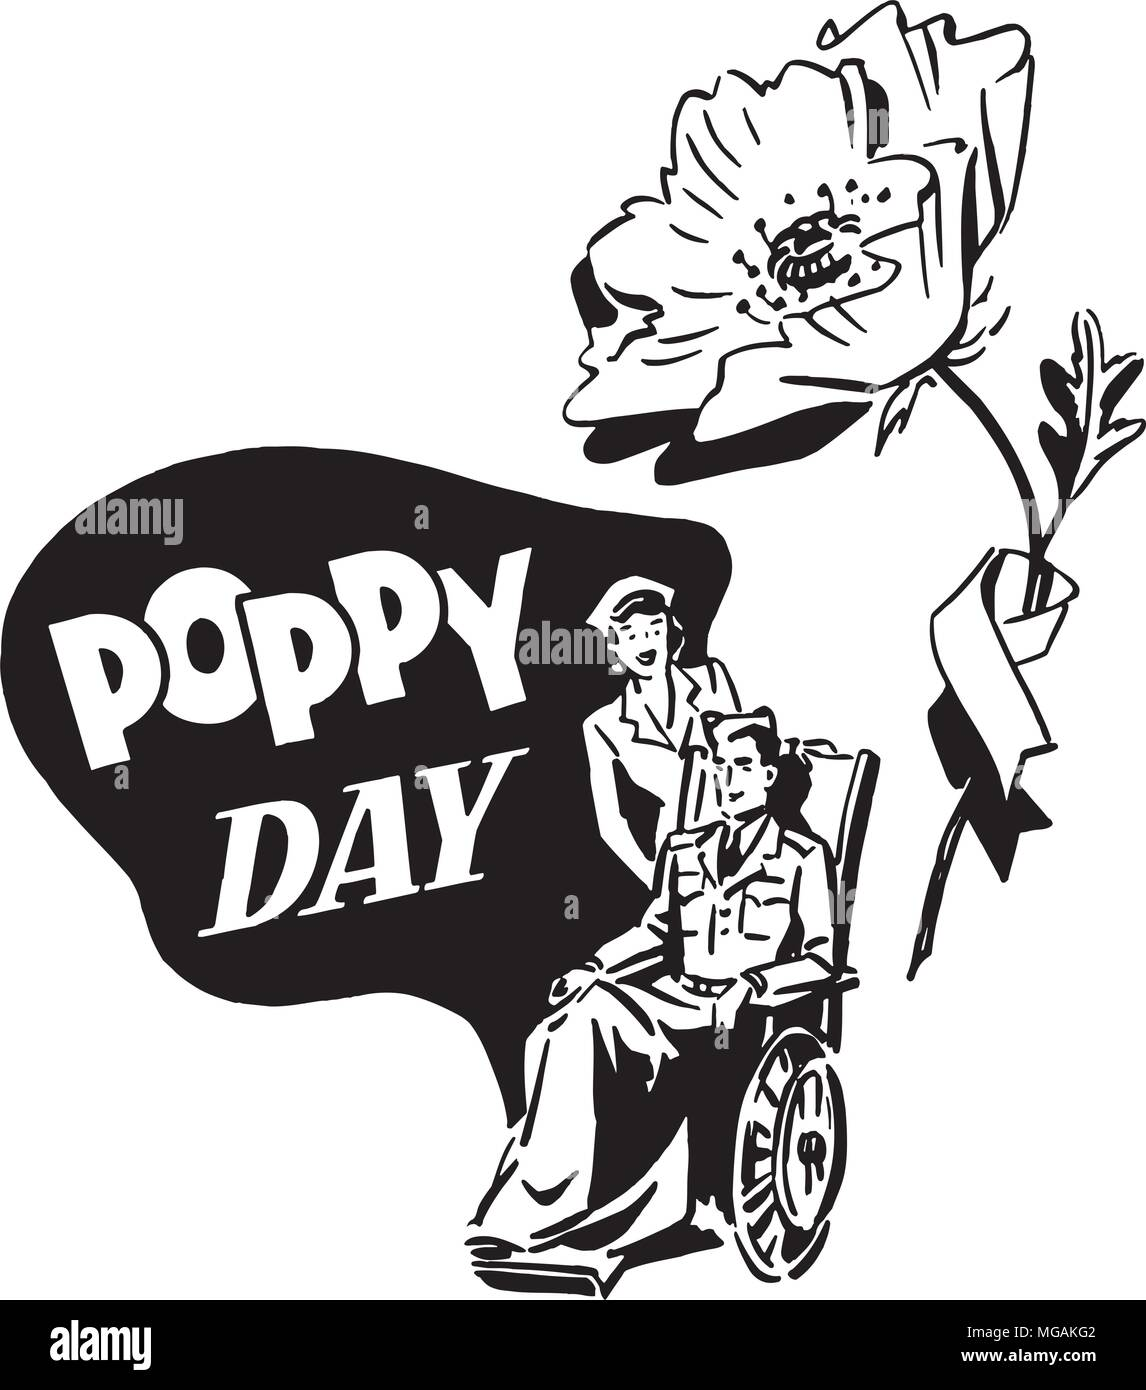 Poppy Day - Retro Clipart Illustration - Stock Vector